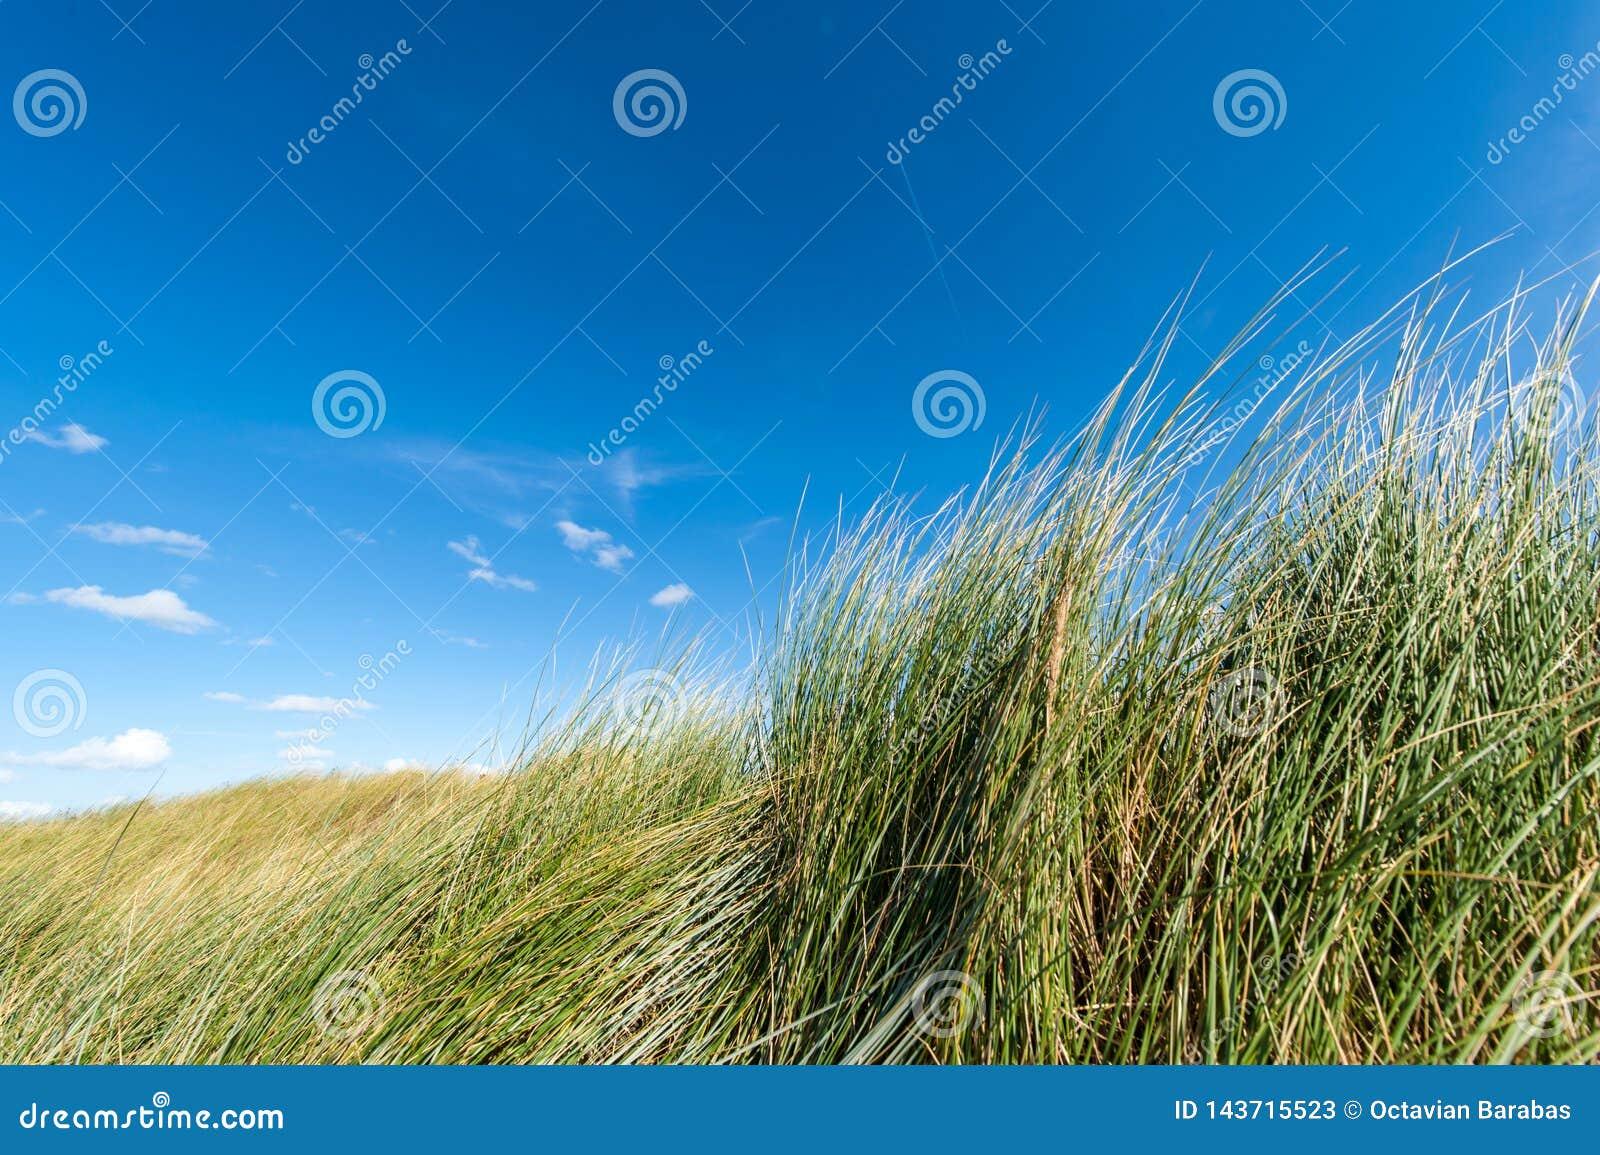 Close up of grass on sandy beach